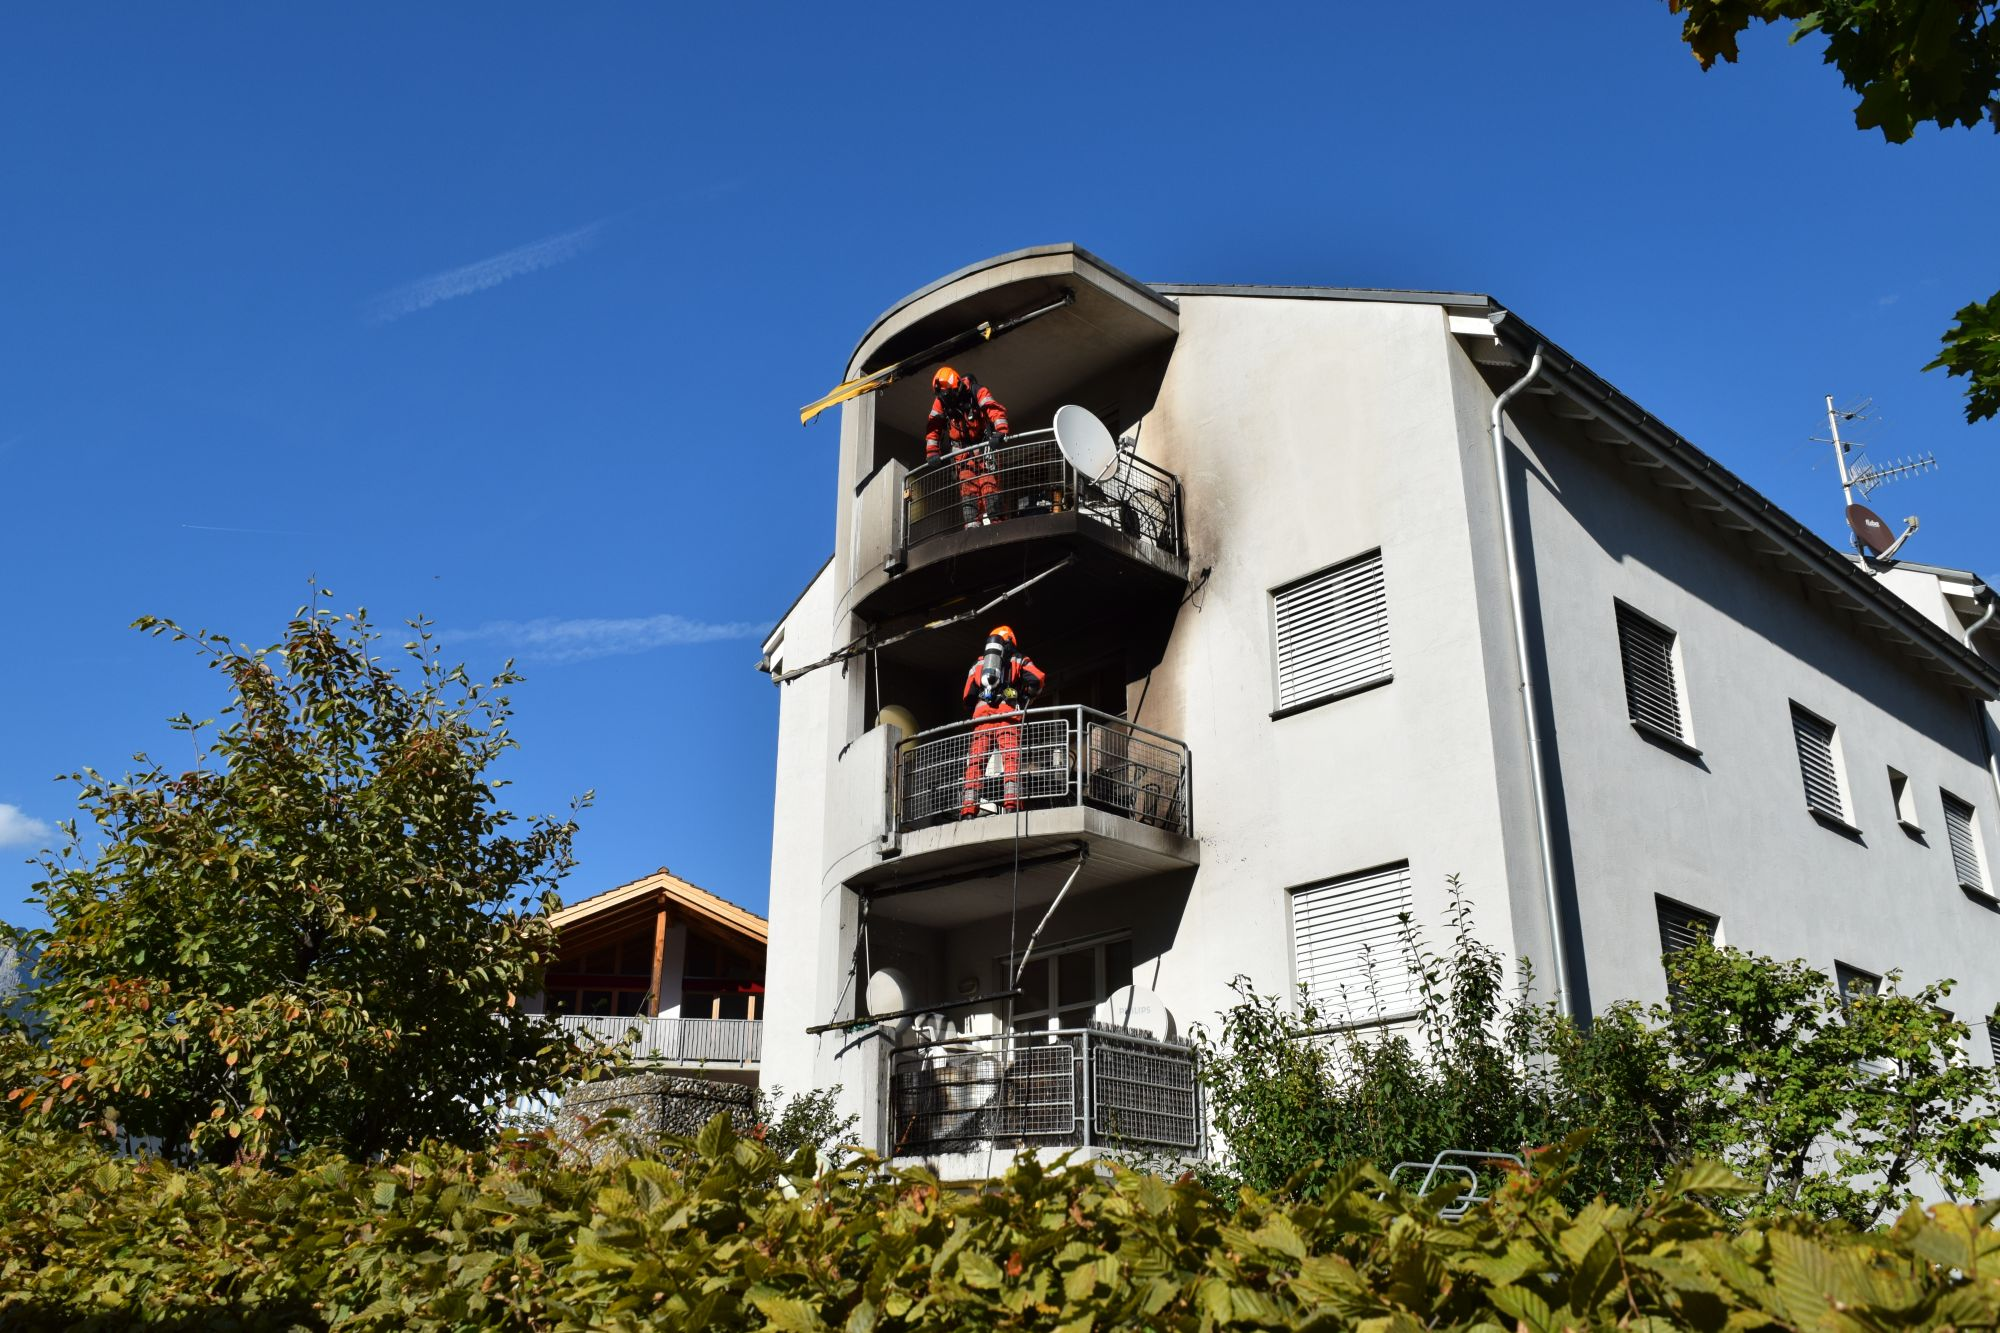 29.09.2019 - Balkonbrand Mehrfamilienhaus